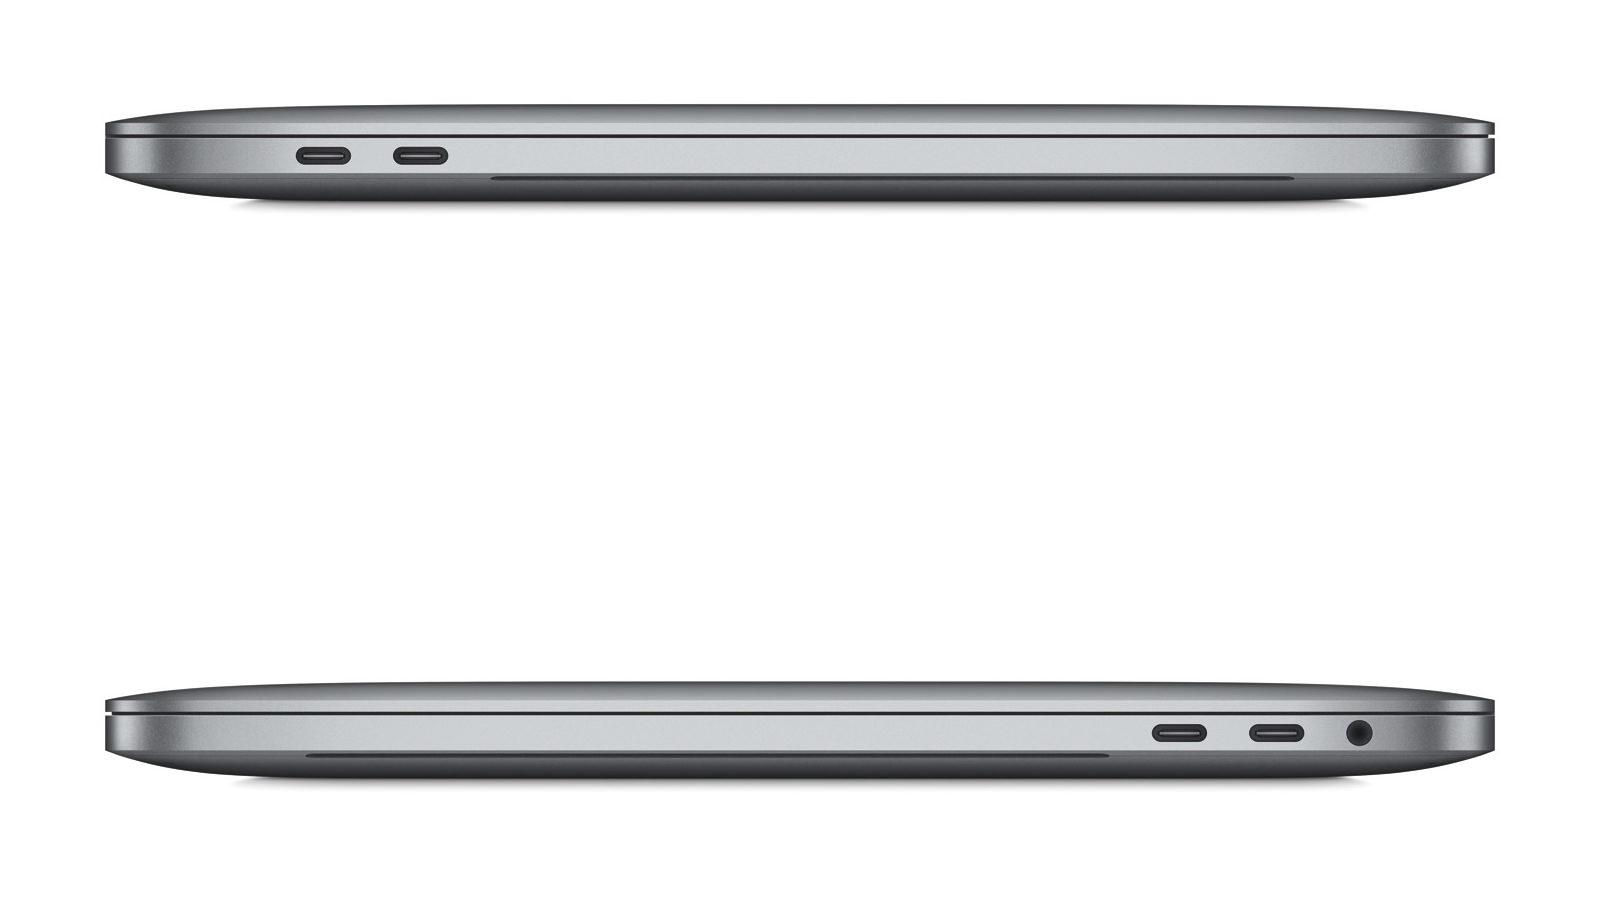 MacBook-Pro-13inch-model-Thunderbolt-ports.jpg